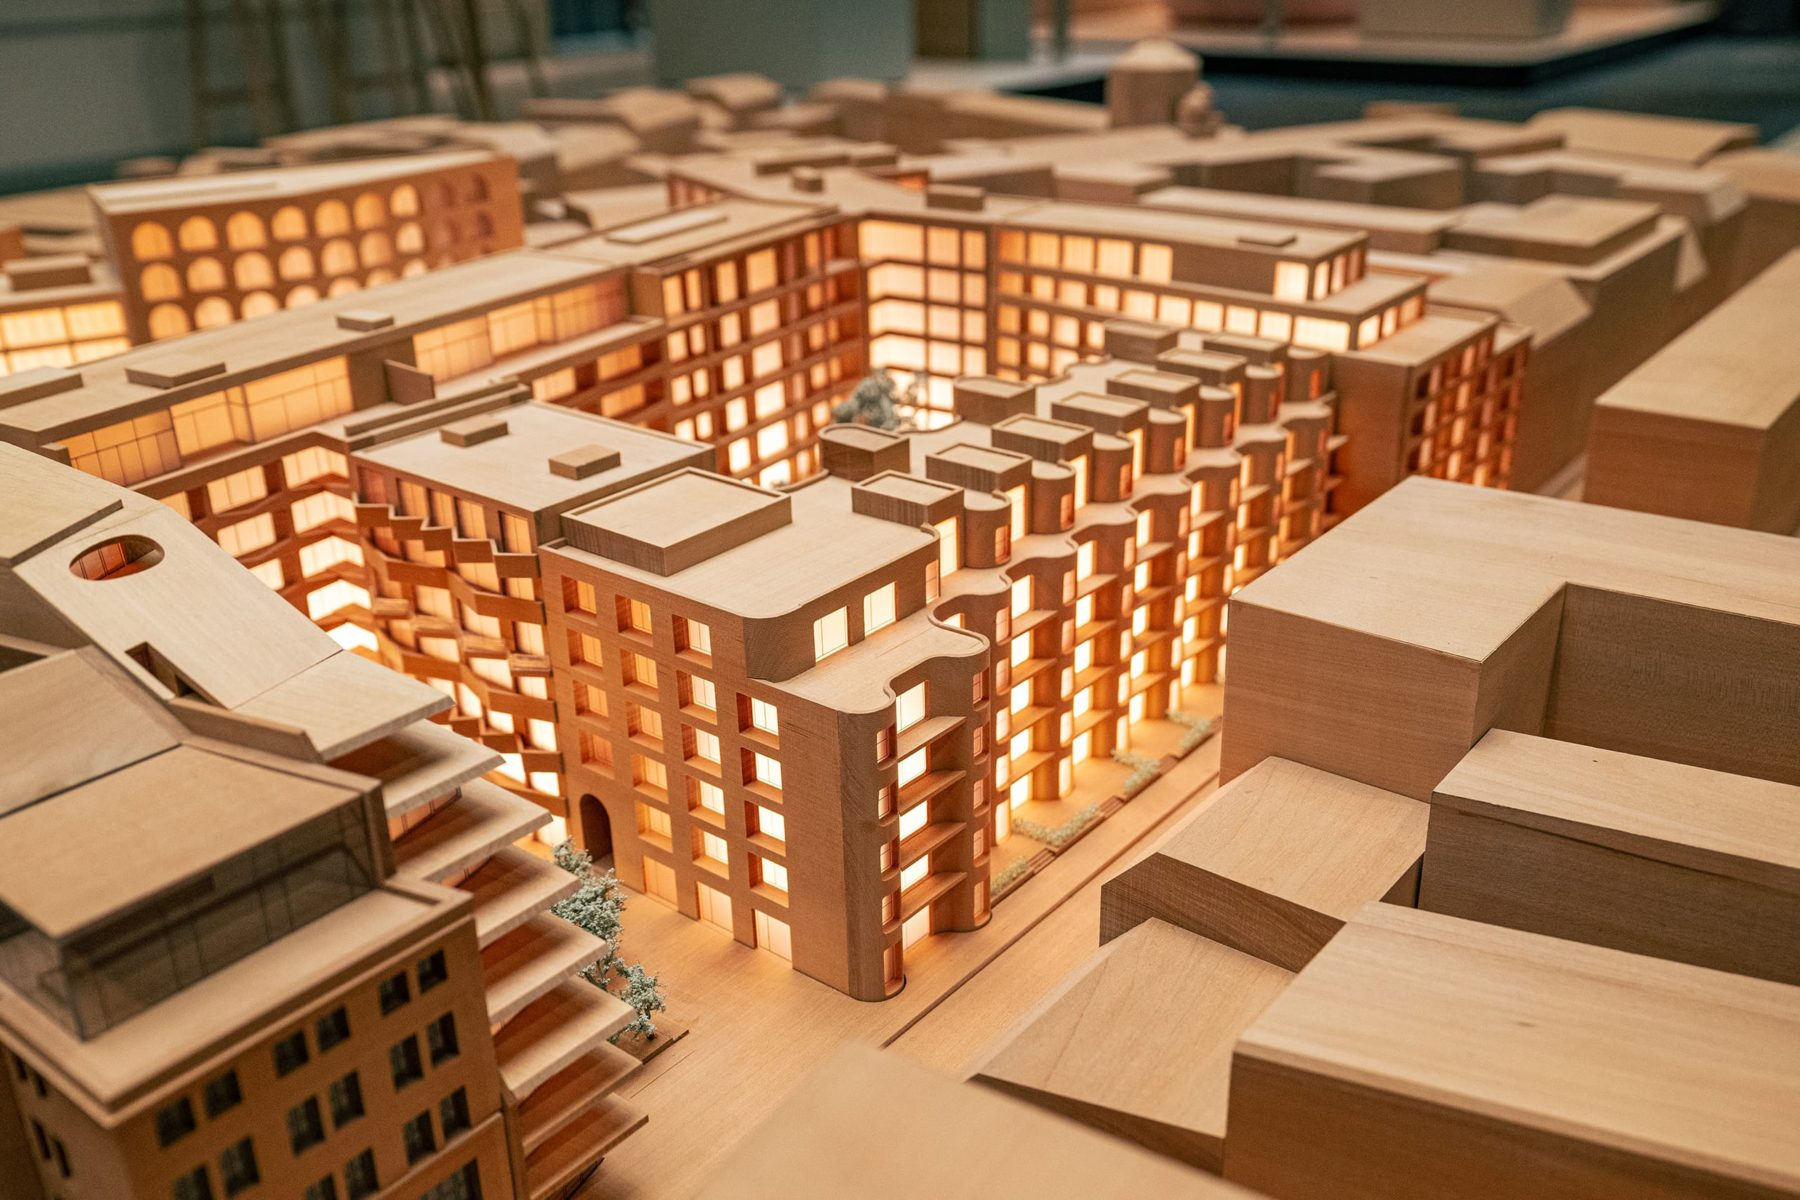 Statdmodell Berlin aus Holz, Nahaufnahme auf Immobilienprojekt Am Tacheles